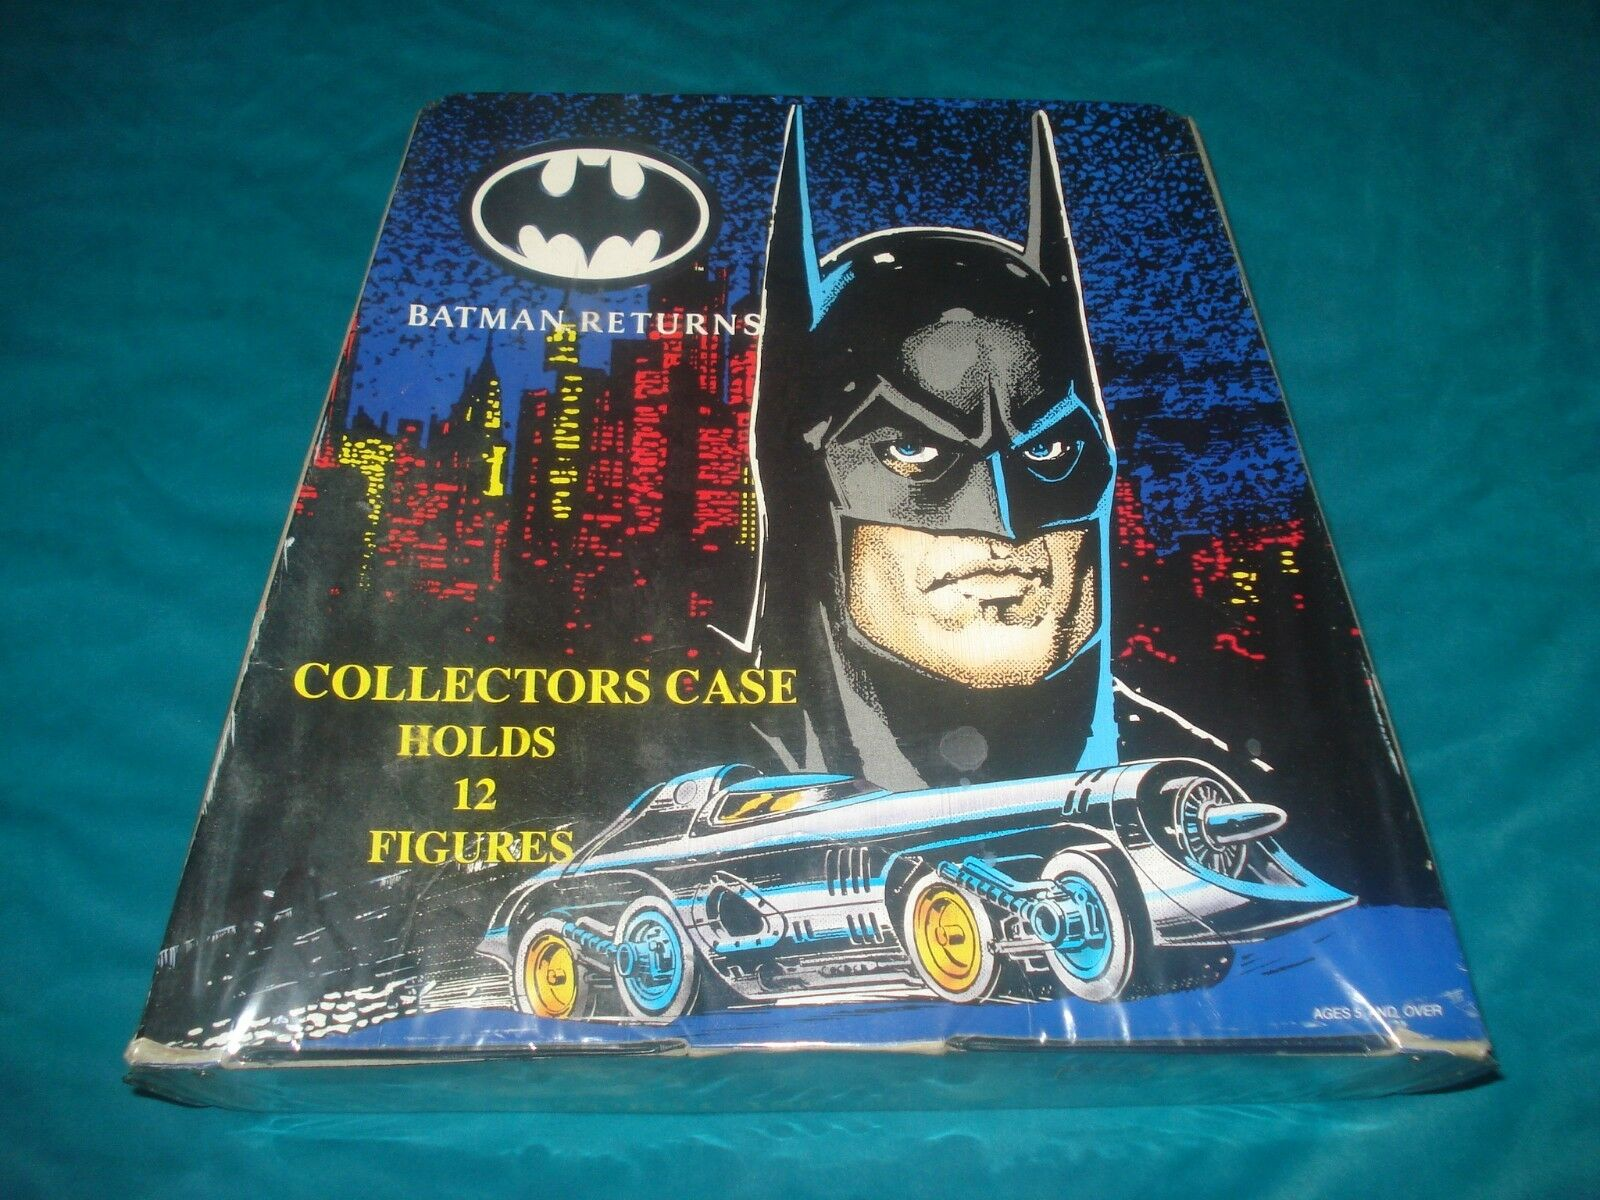 VINTAGE 1992 DC COMICS BATMAN RETURNS COLLECTOR'S VINYL 12 FIGURE CARRYING CASE